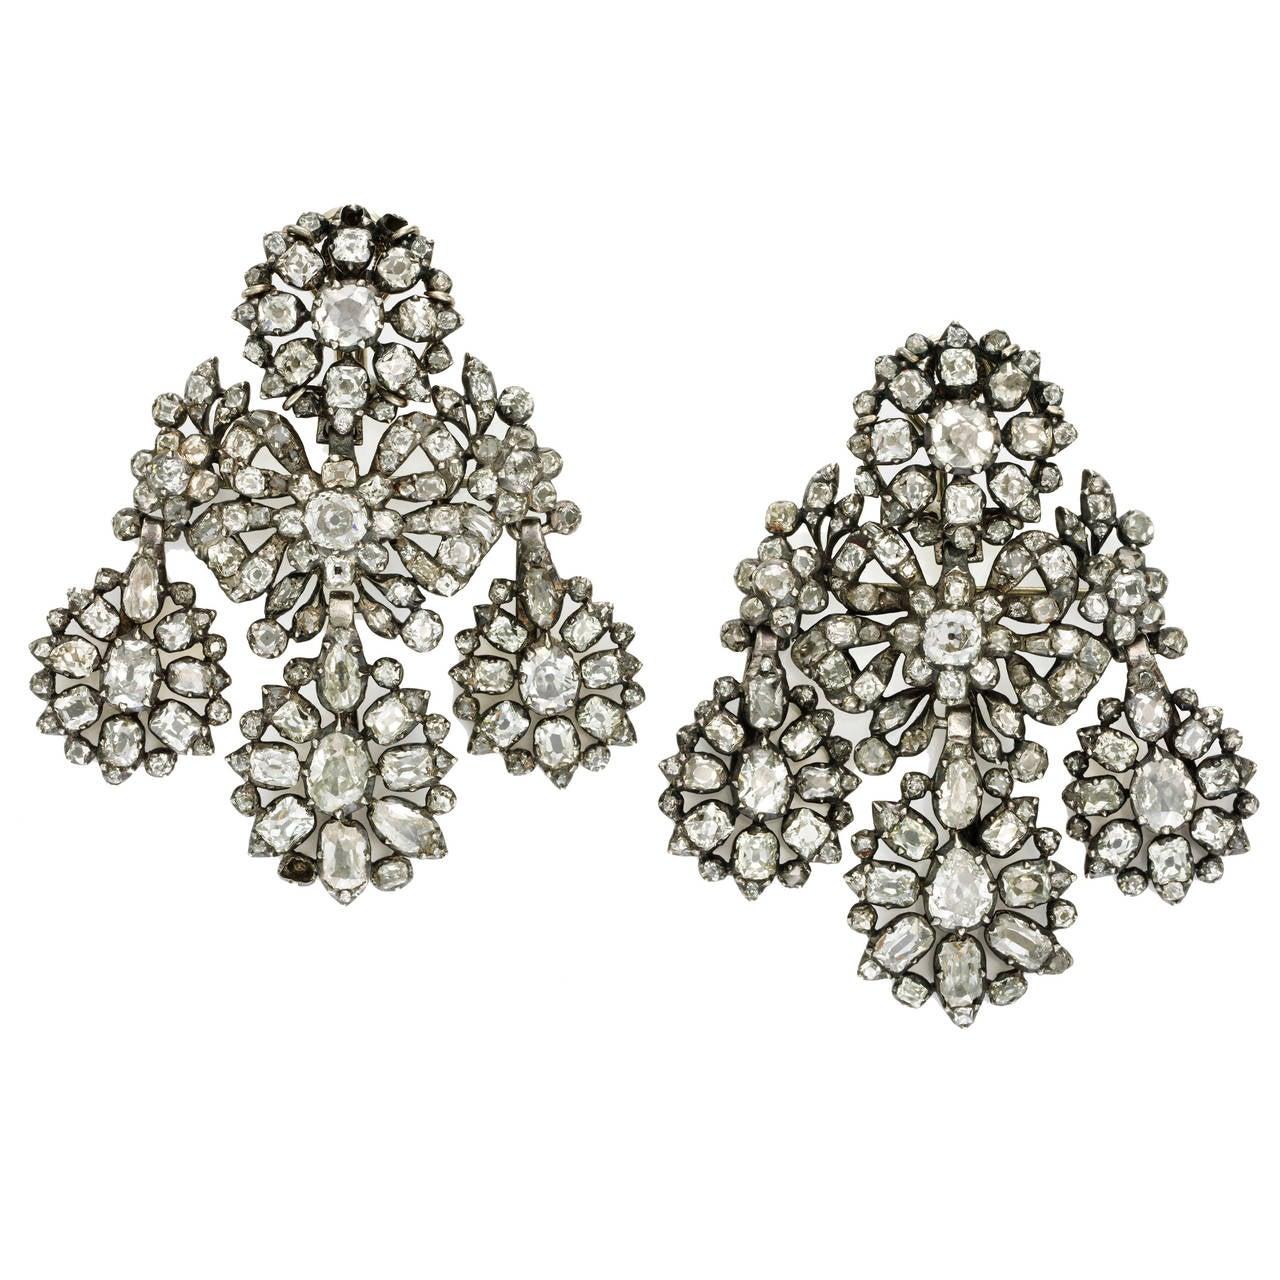 Magnificent 18th Century Diamond Girandole Earrings At 1stdibs